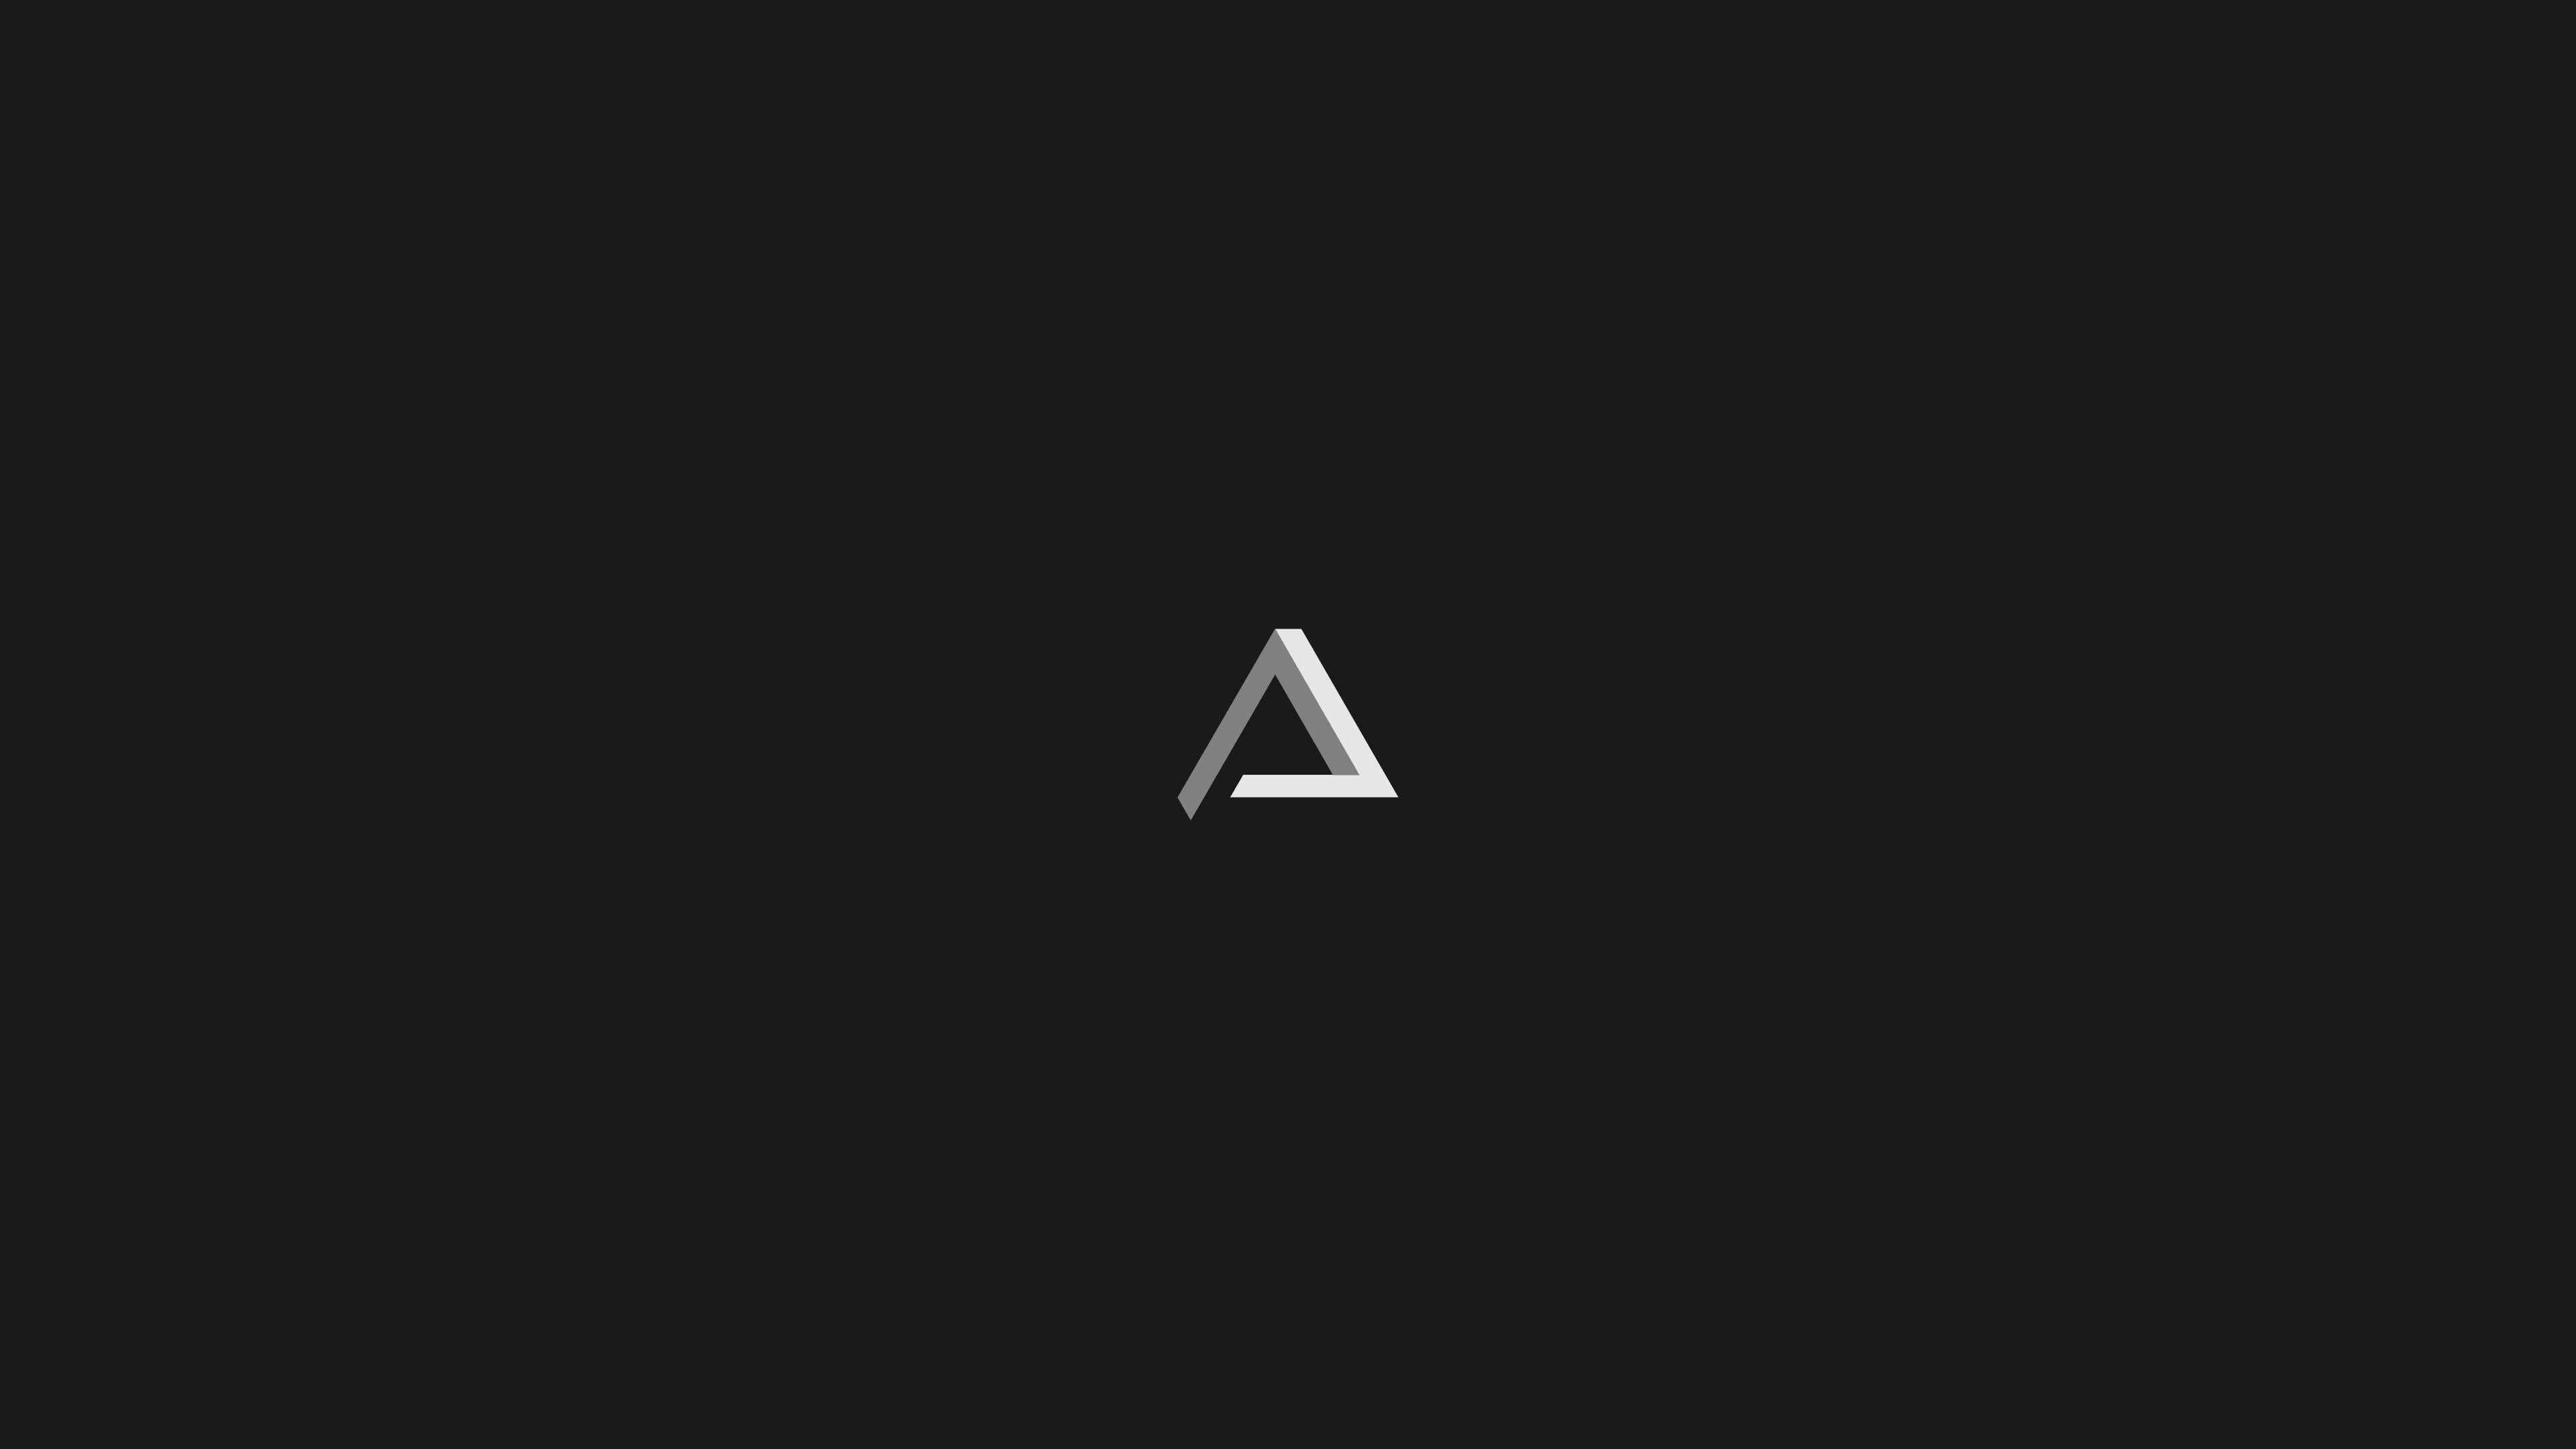 Penrose Triangle Minimalism, HD Artist, 4k Wallpapers ...